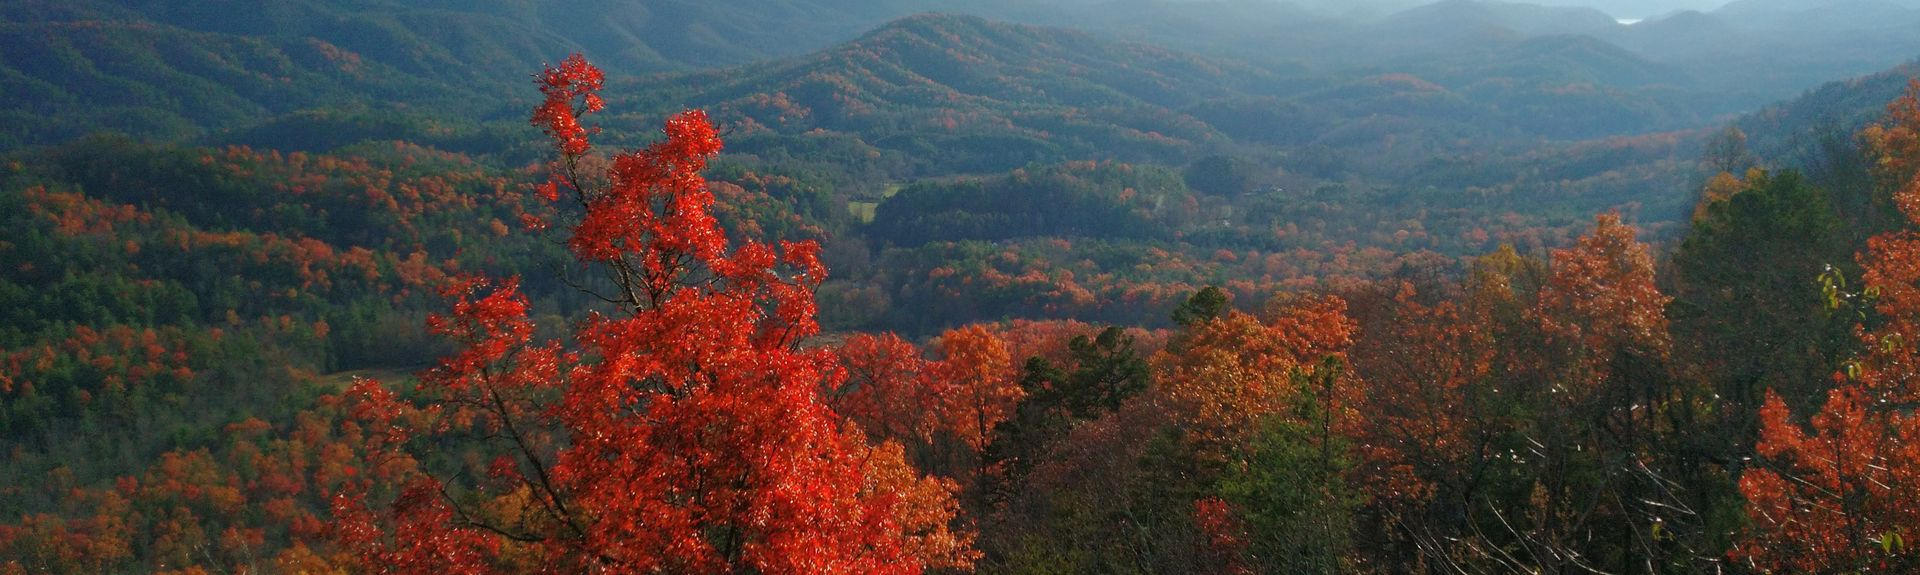 Alcoa, Tennessee, United States